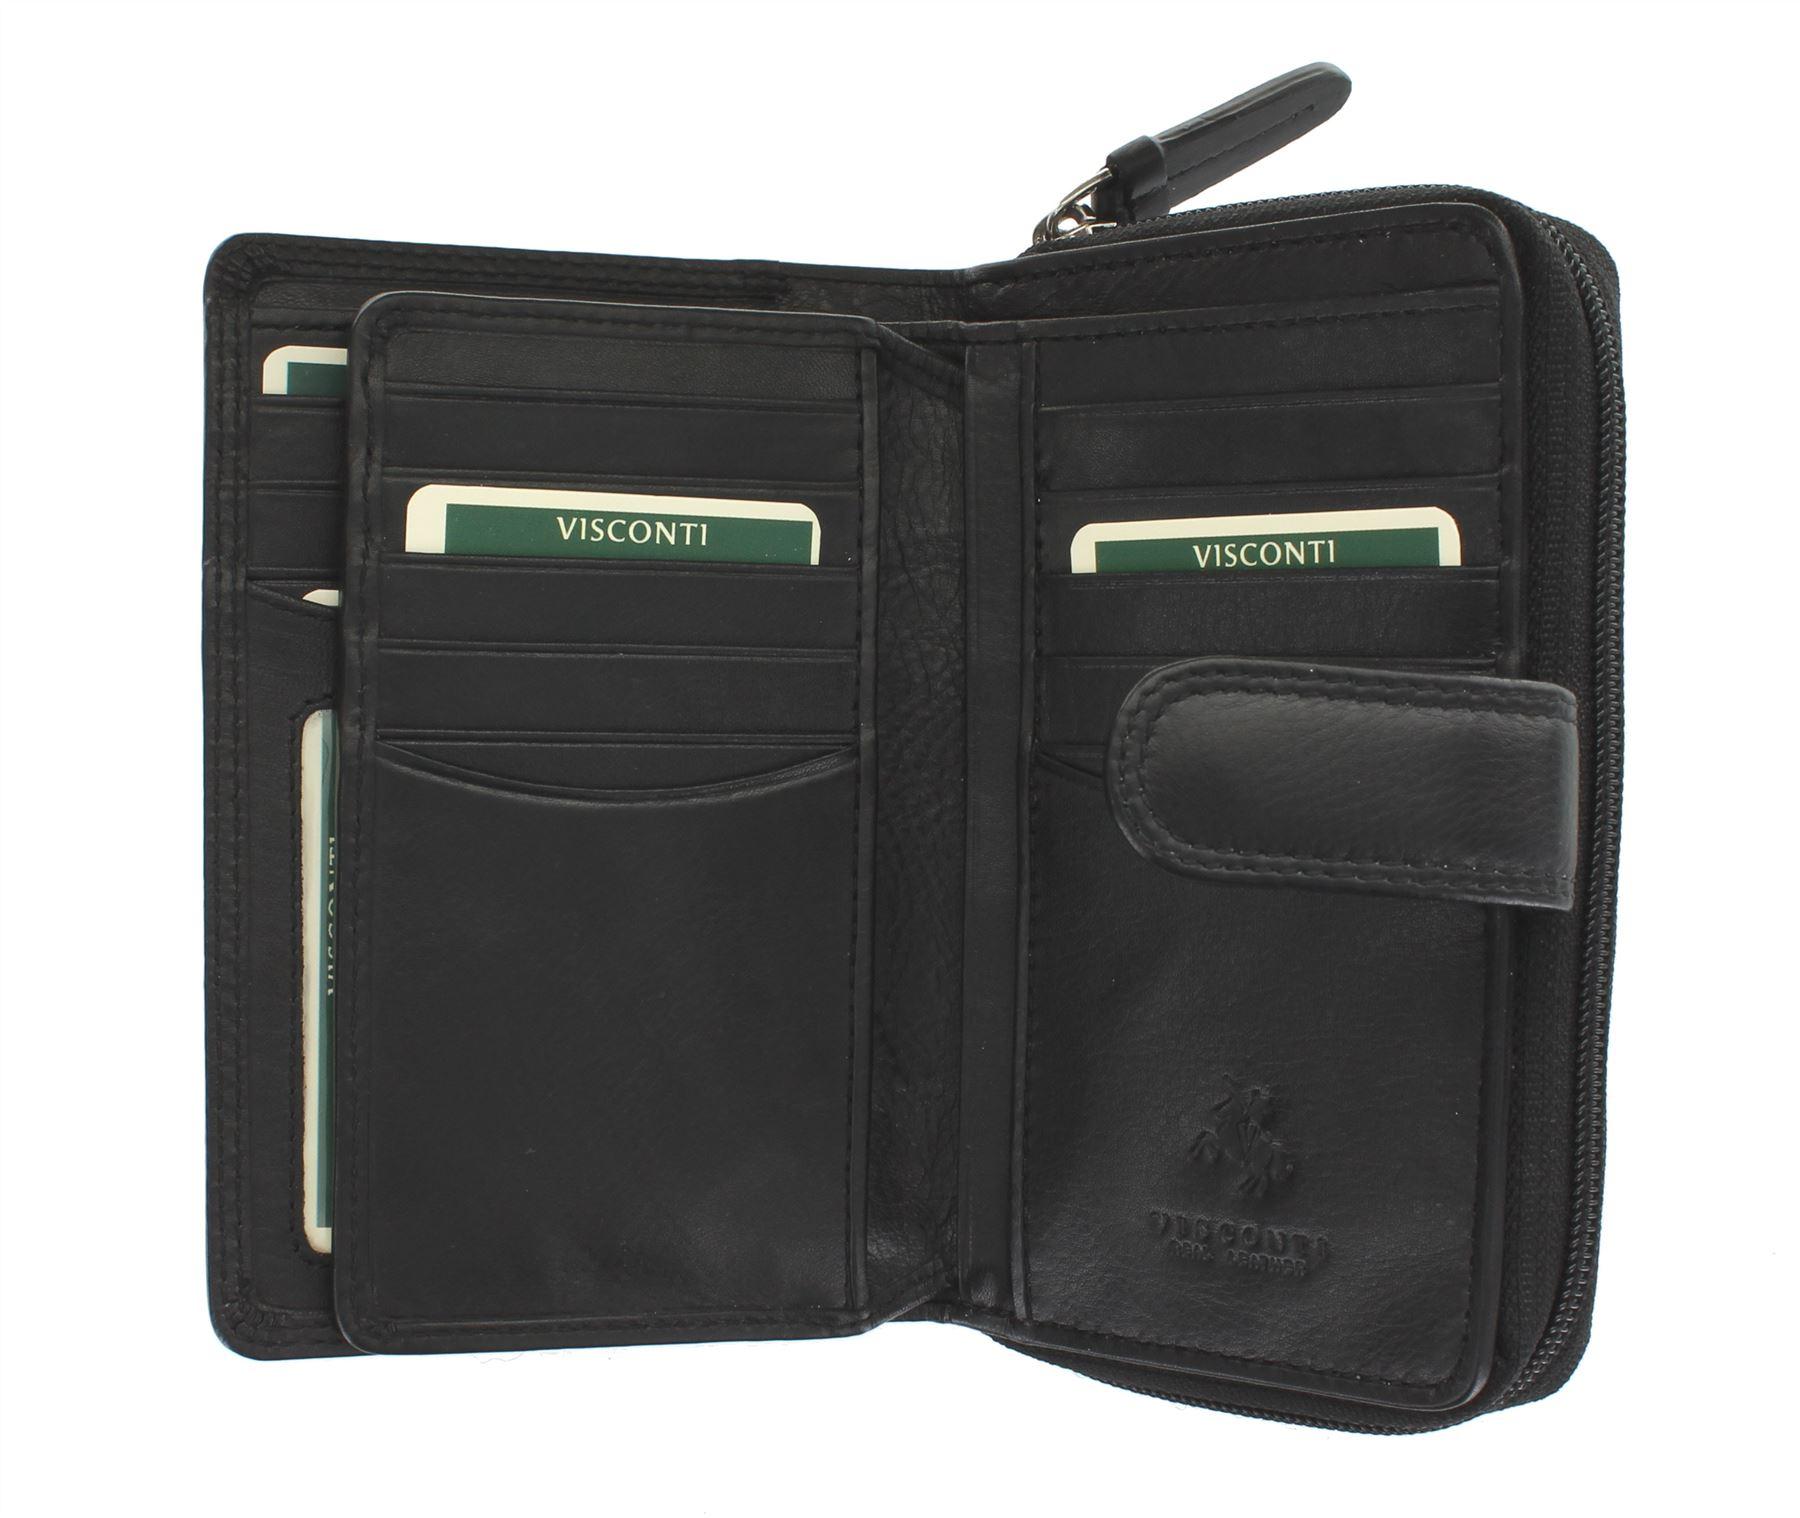 Visconti-Heritage-Collection-MADAME-Leather-Purse-Tab-Closure-RFID-blocking-HT33 miniatura 4